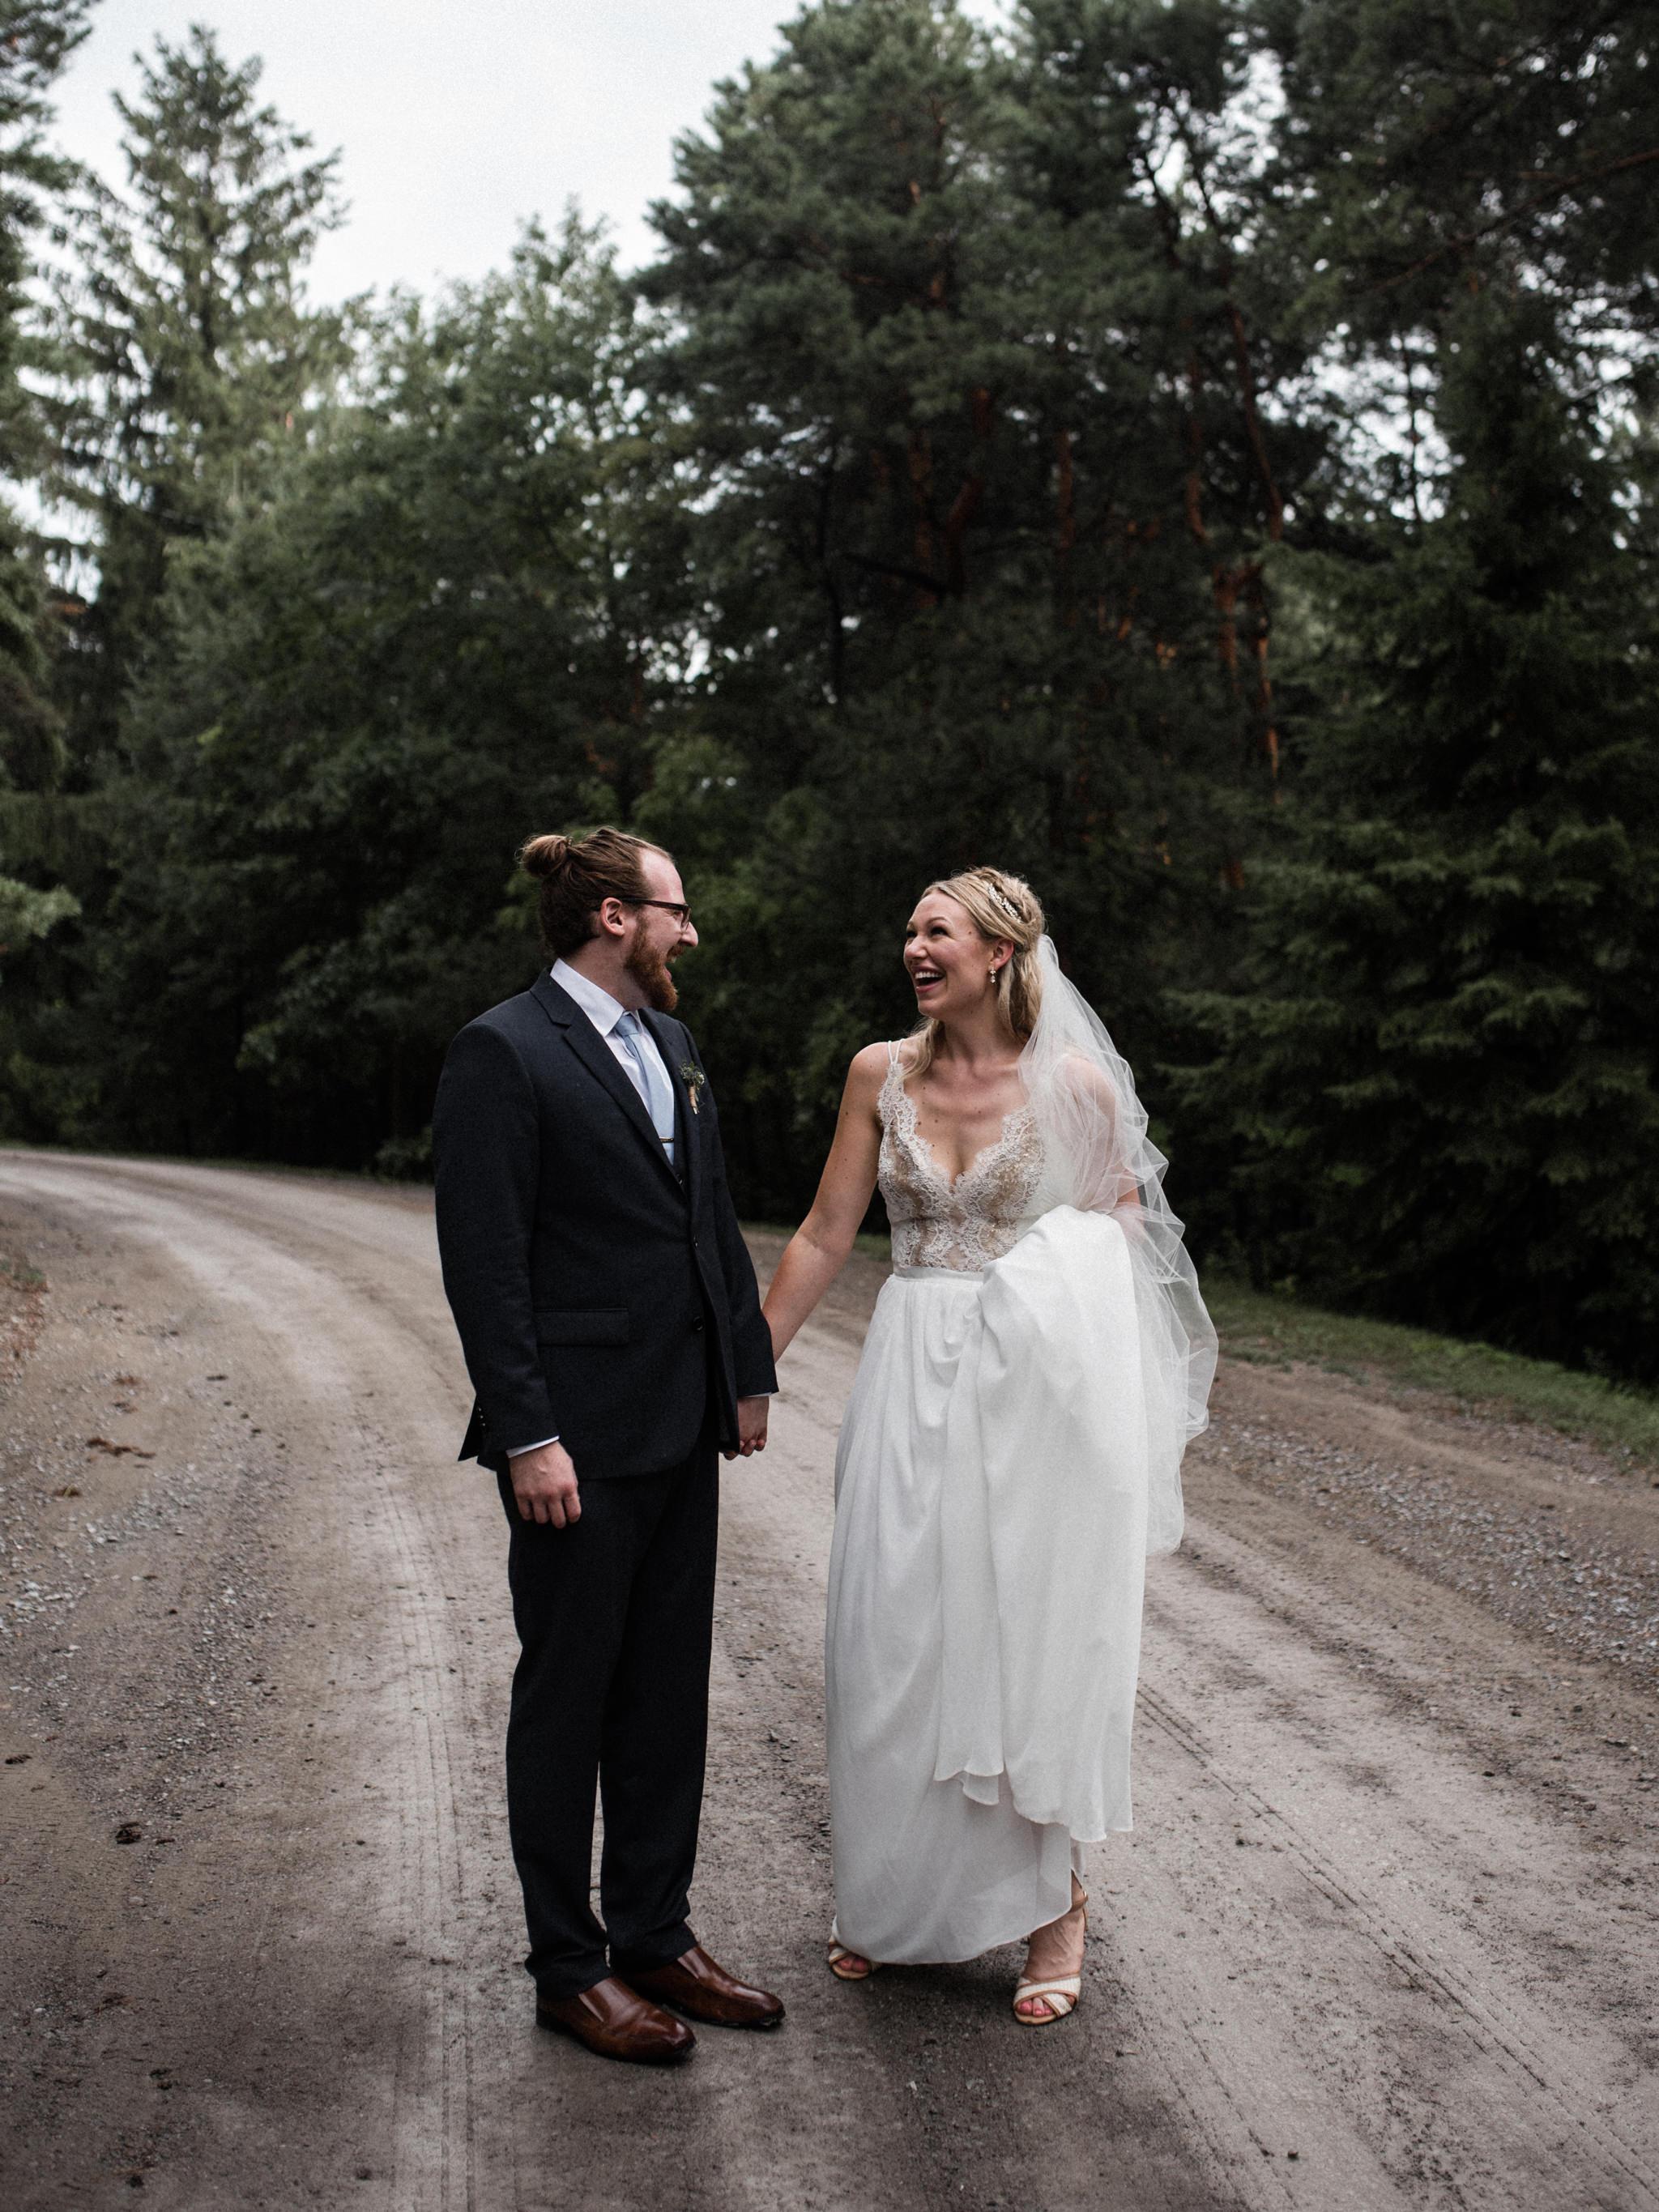 skyloft-wedding-toronto-wedding-photographer-40.jpg